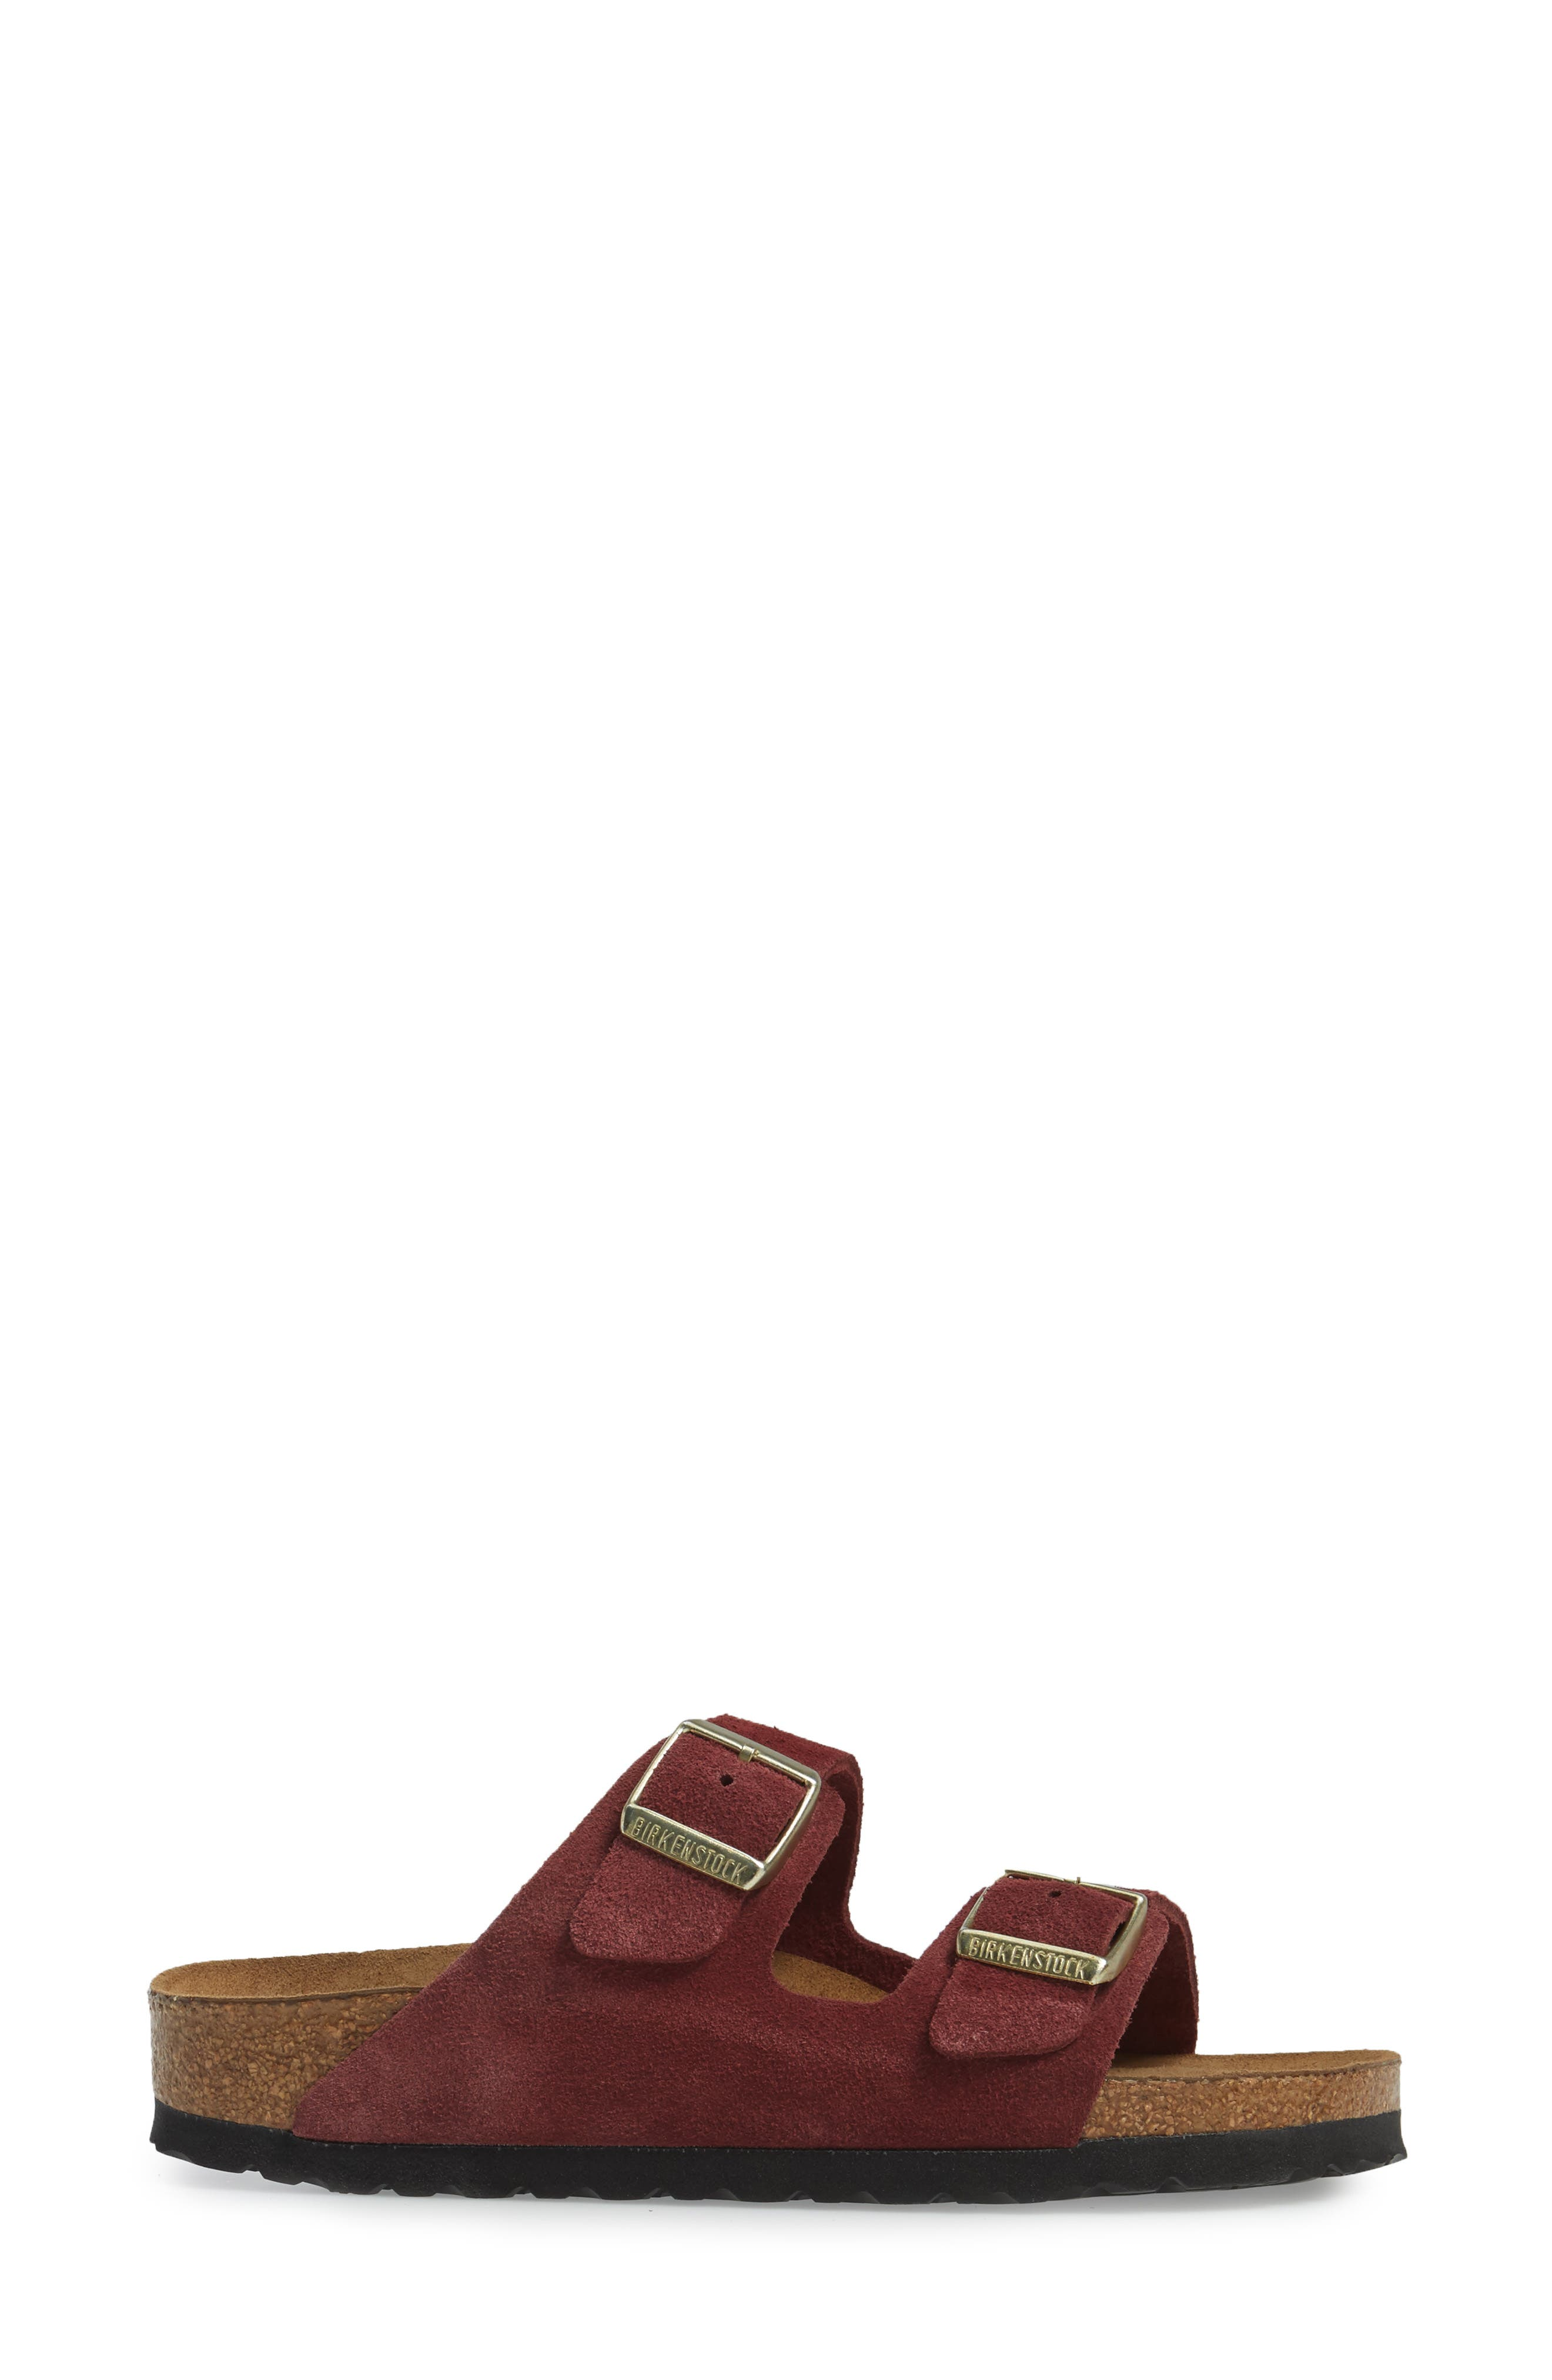 Alternate Image 3  - Birkenstock 'Arizona' Soft Footbed Suede Sandal (Women)